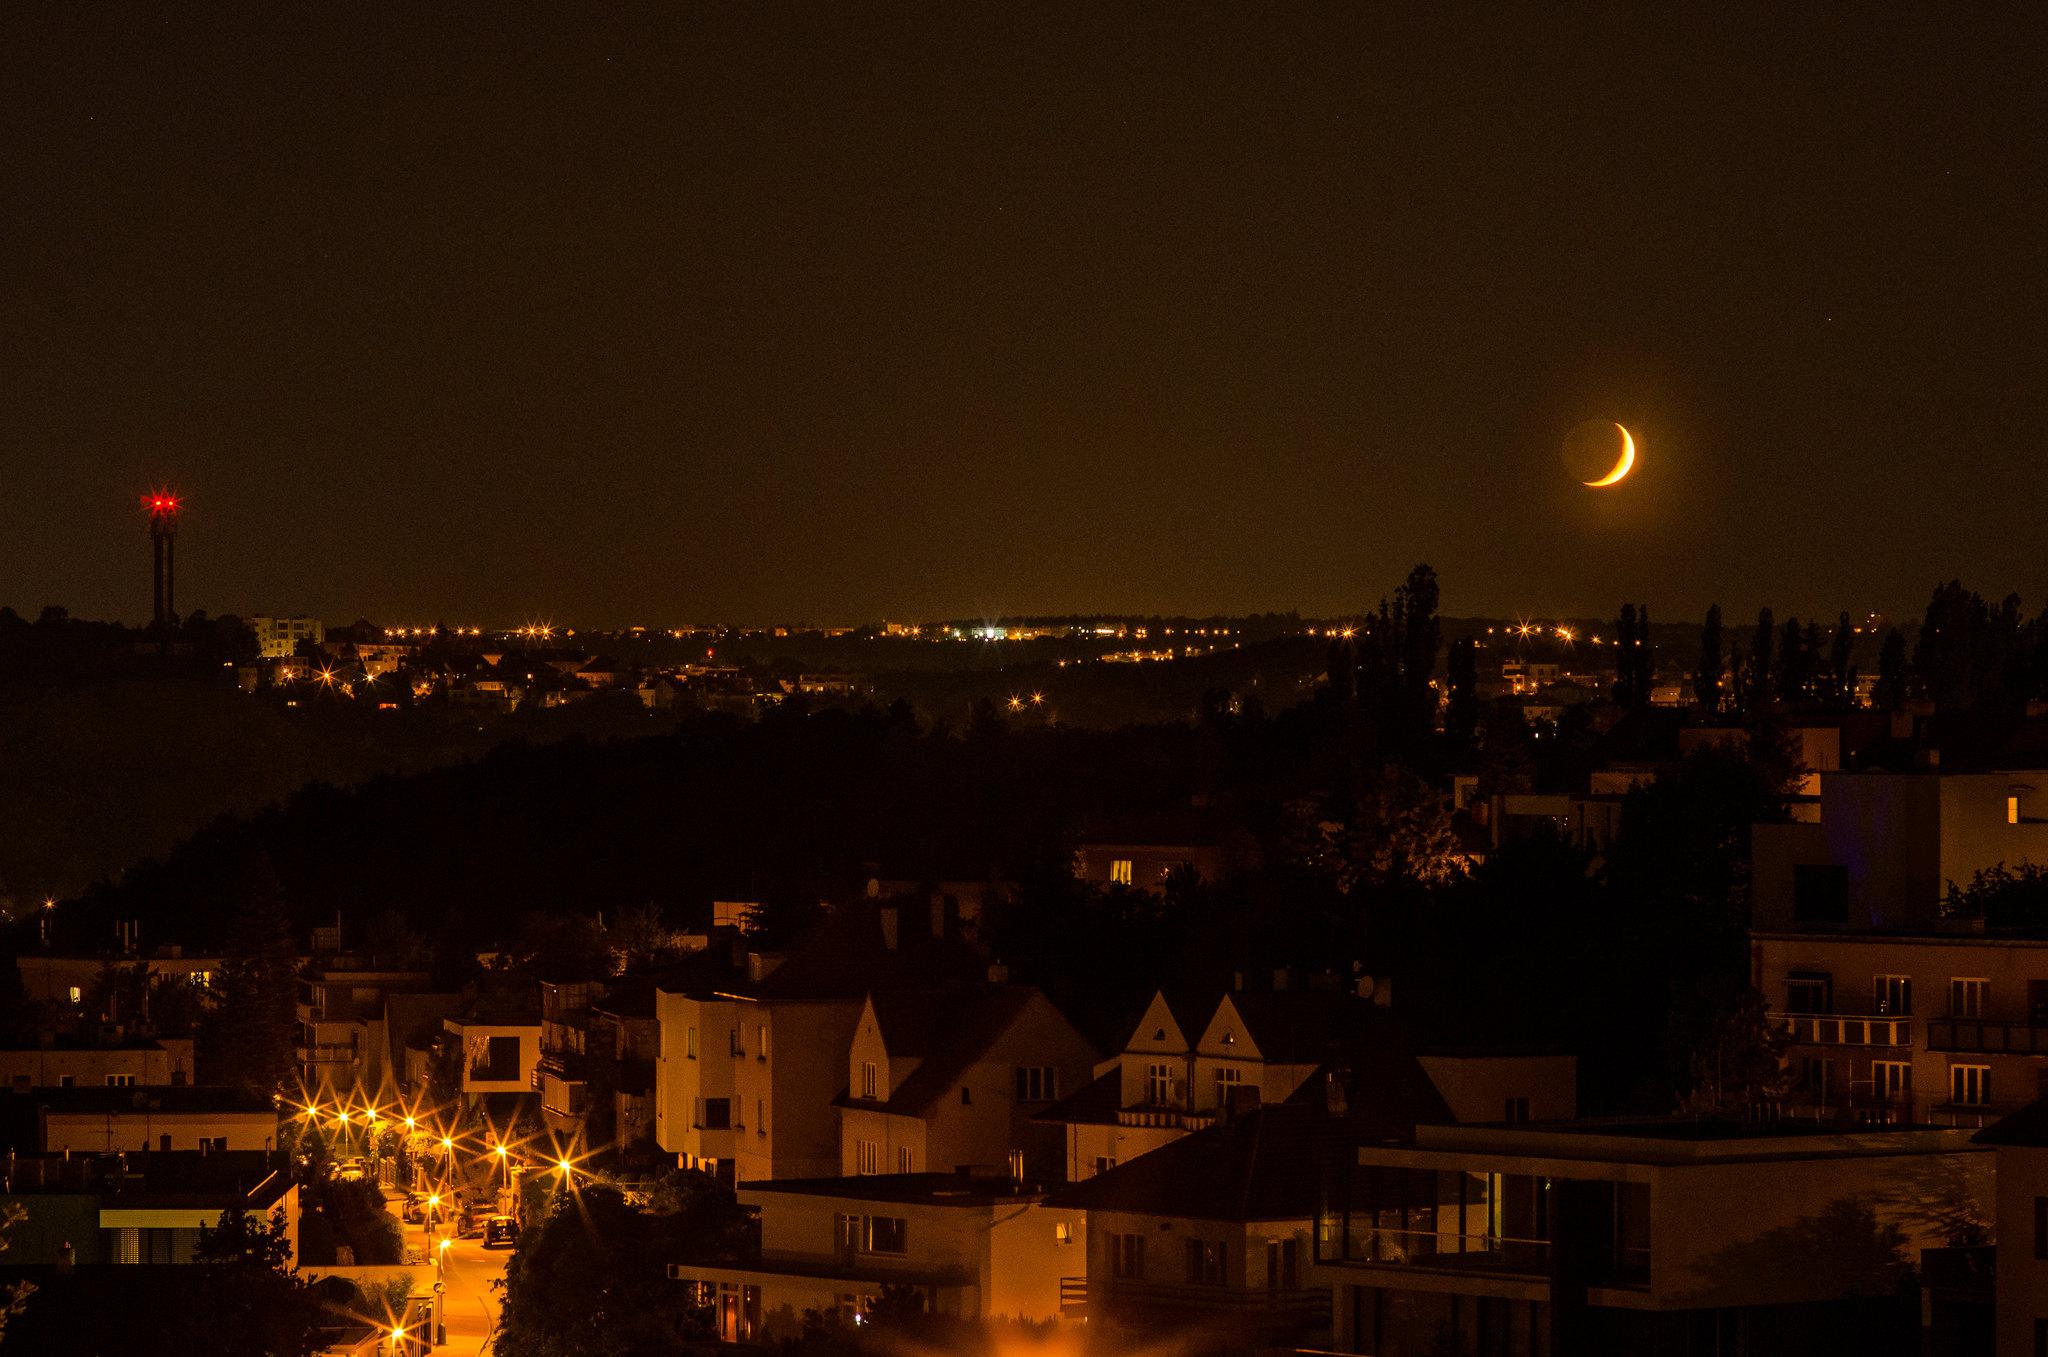 Moonset over Prague